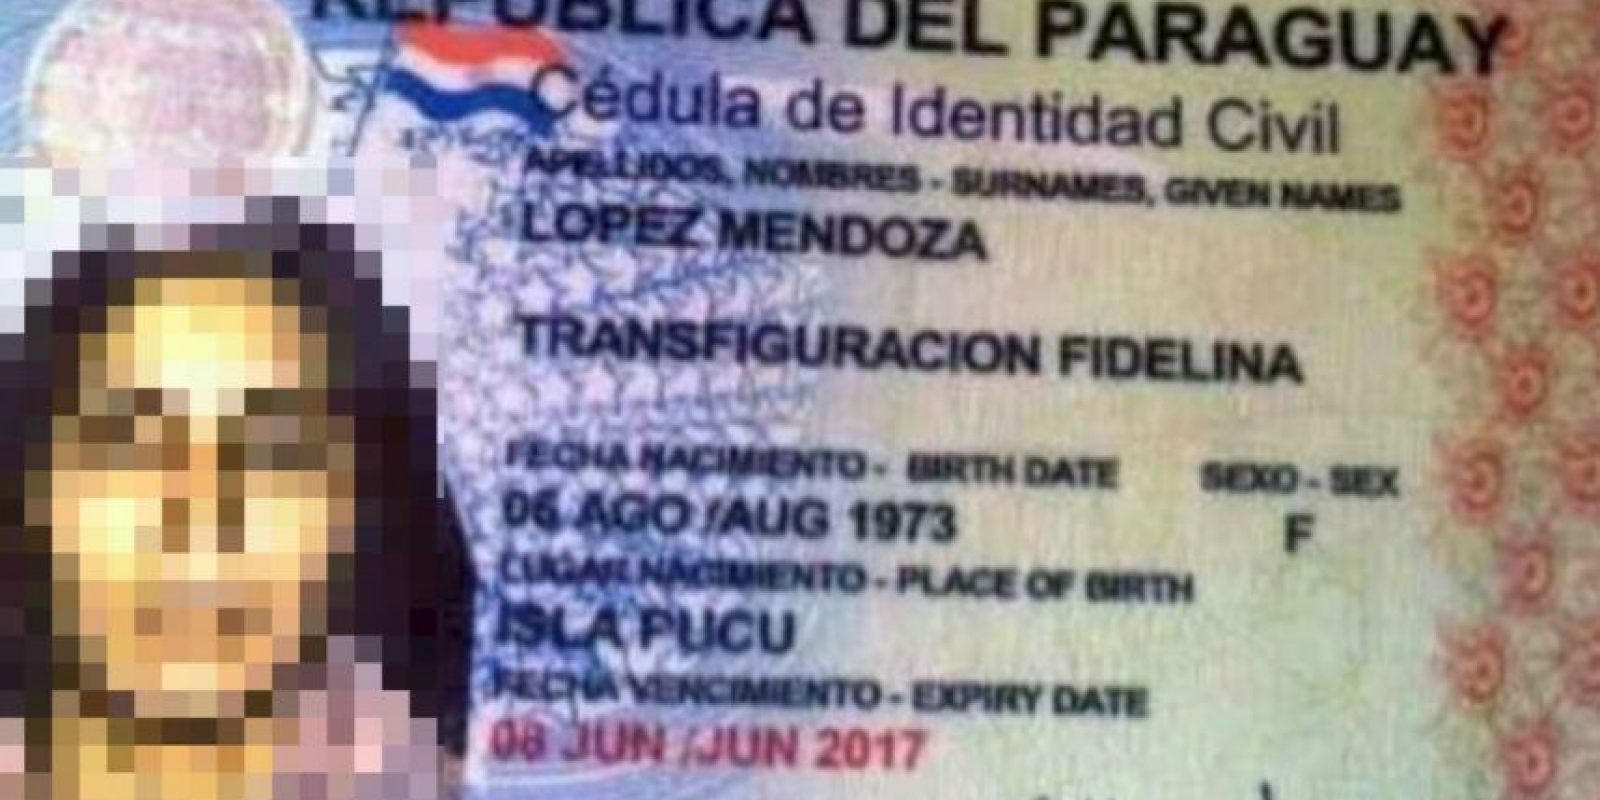 Nombres reales que parecen un broma: Transfiguracion Fidelina Foto:Recreoviral